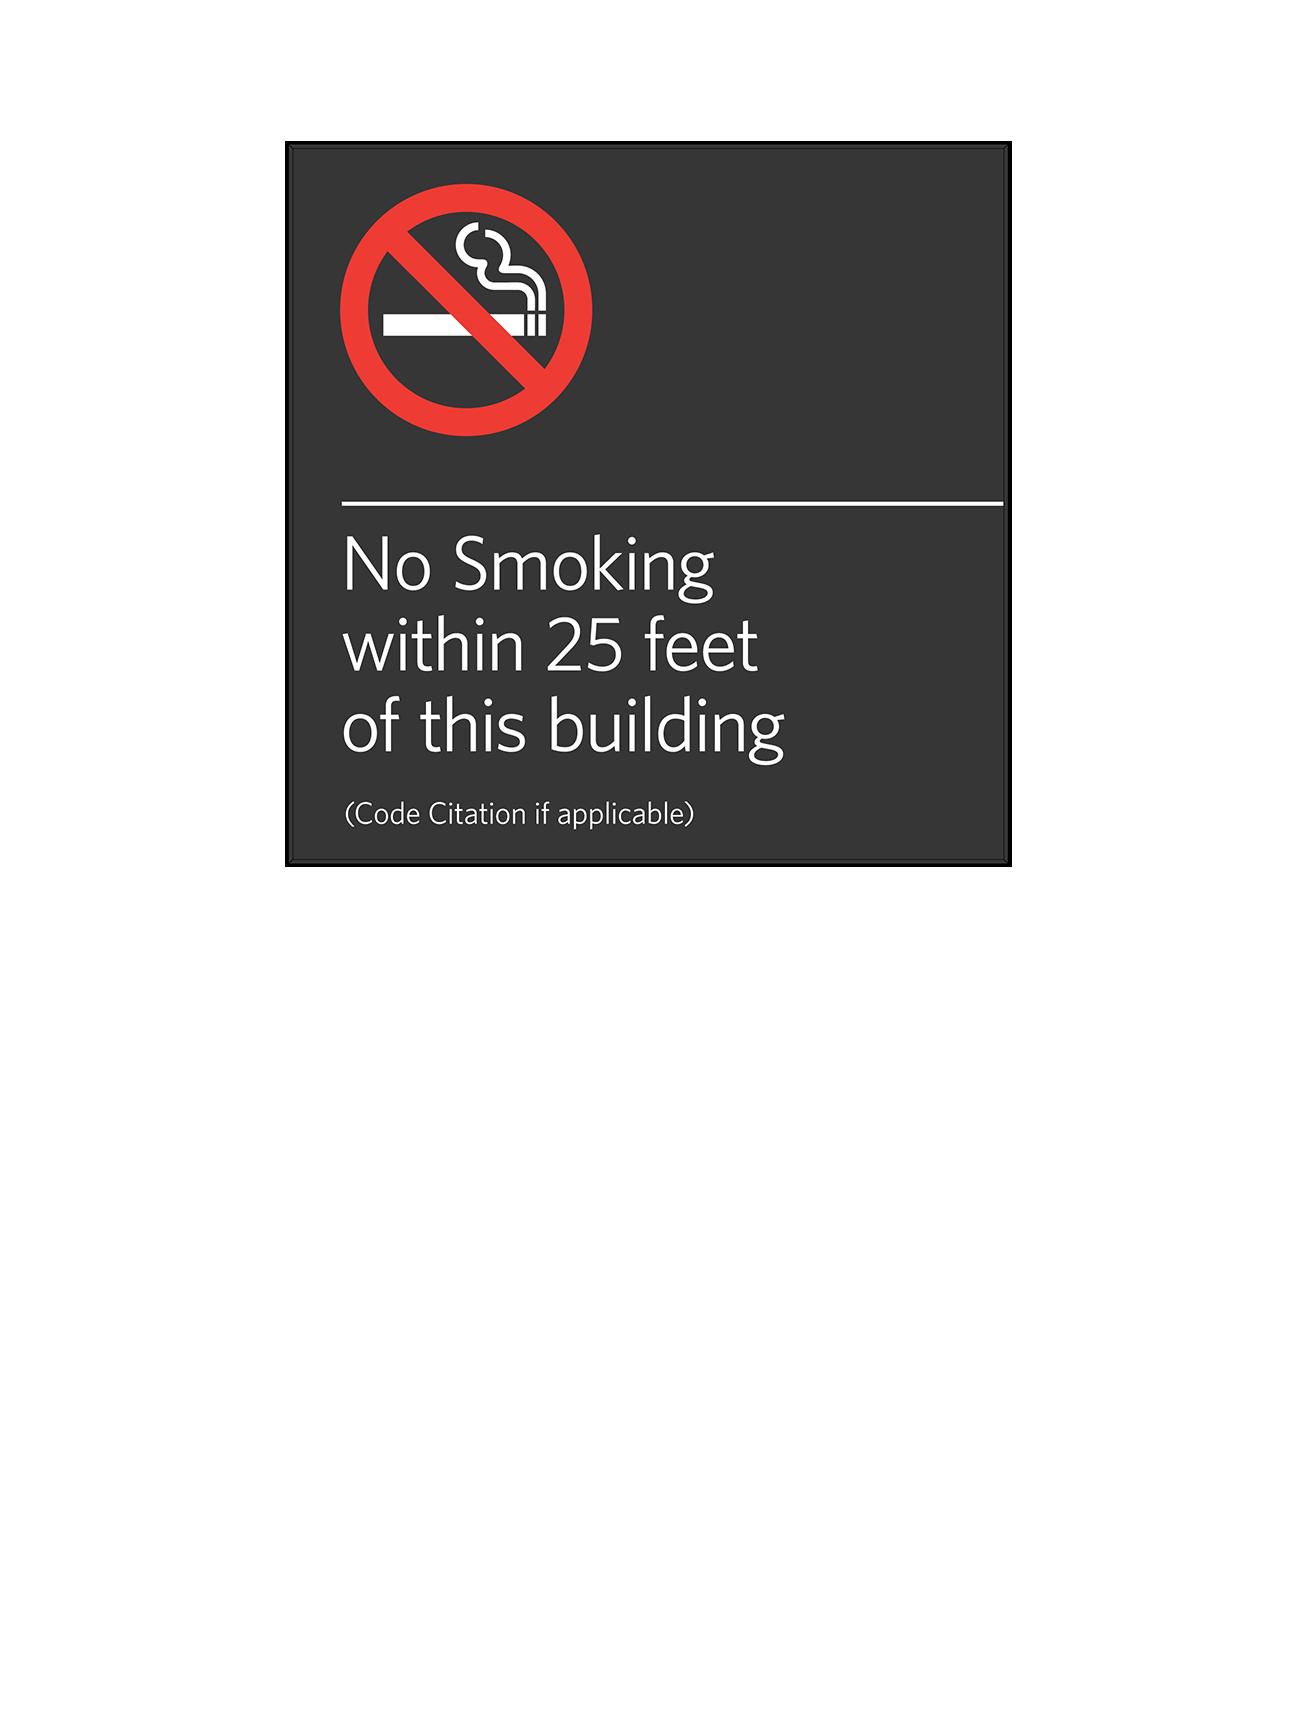 Sign:Regulatory, No Smoking